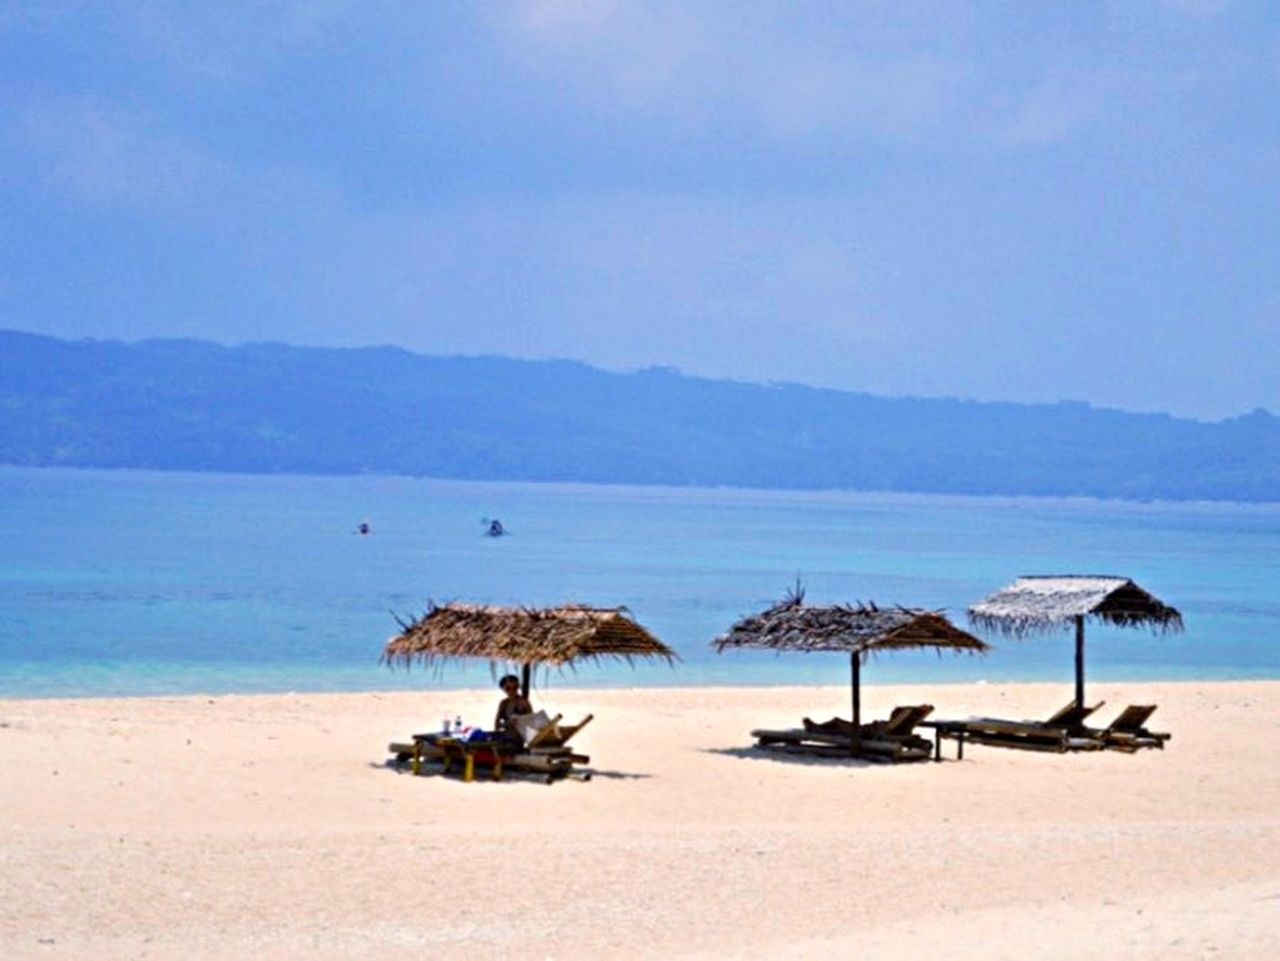 Pukka Beach Boracay Boracay Philippines Beach Sea Eyeem Philippines